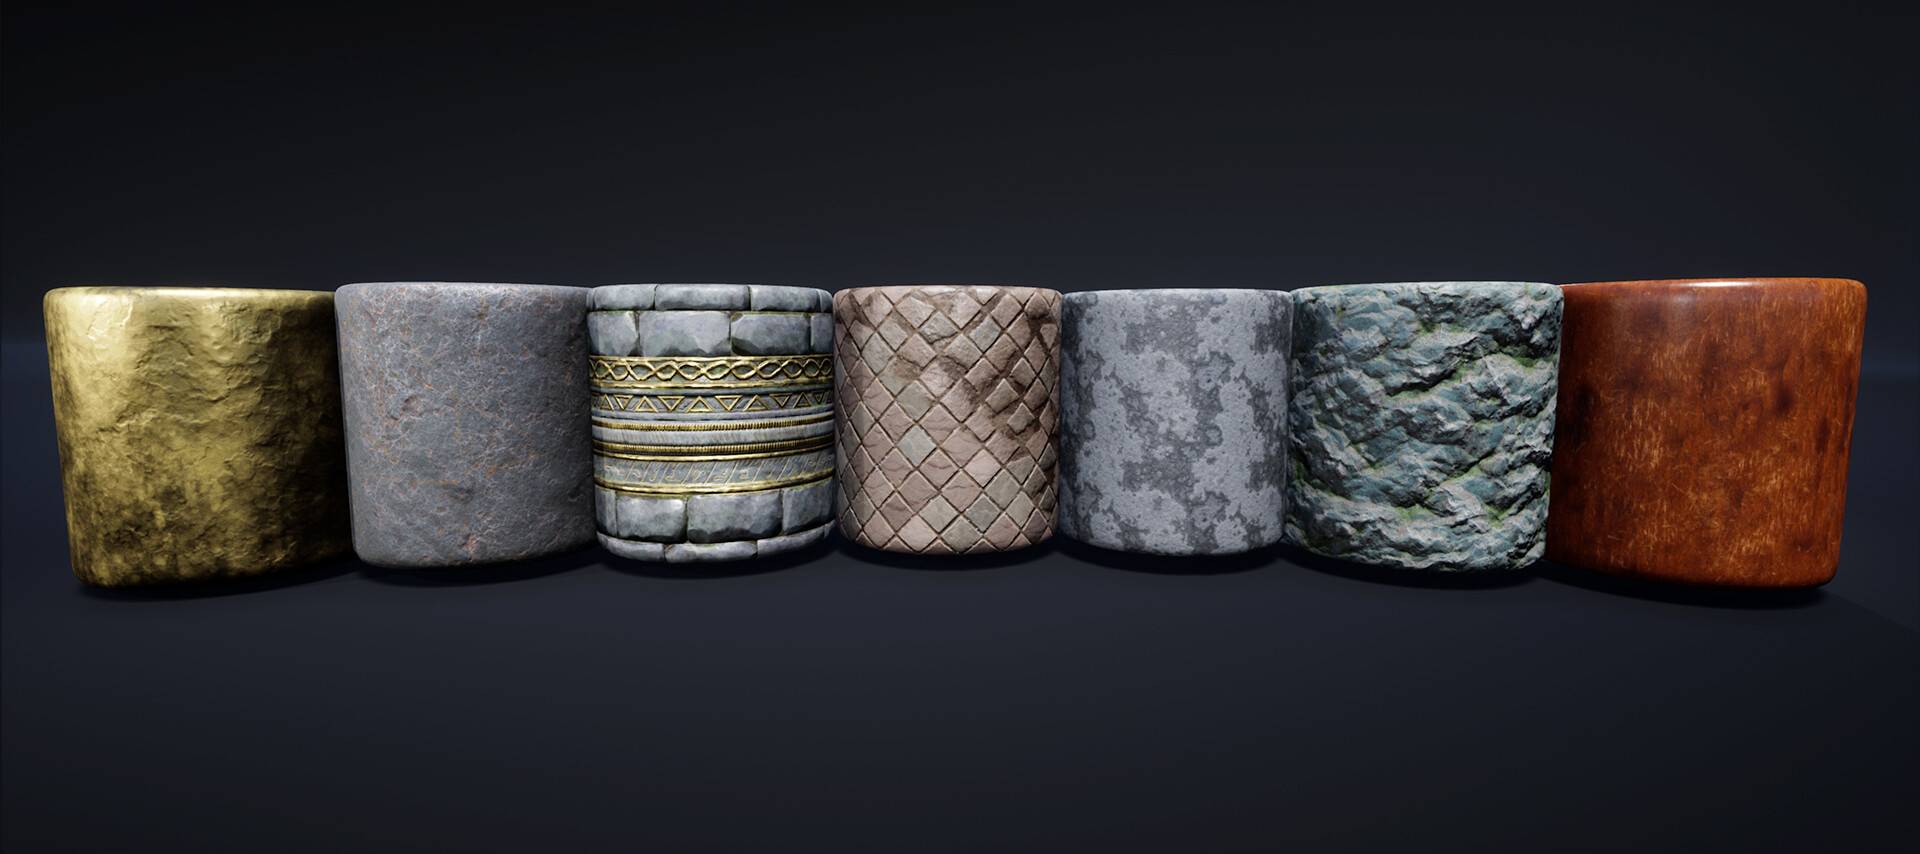 Materials - Rendered in UE4